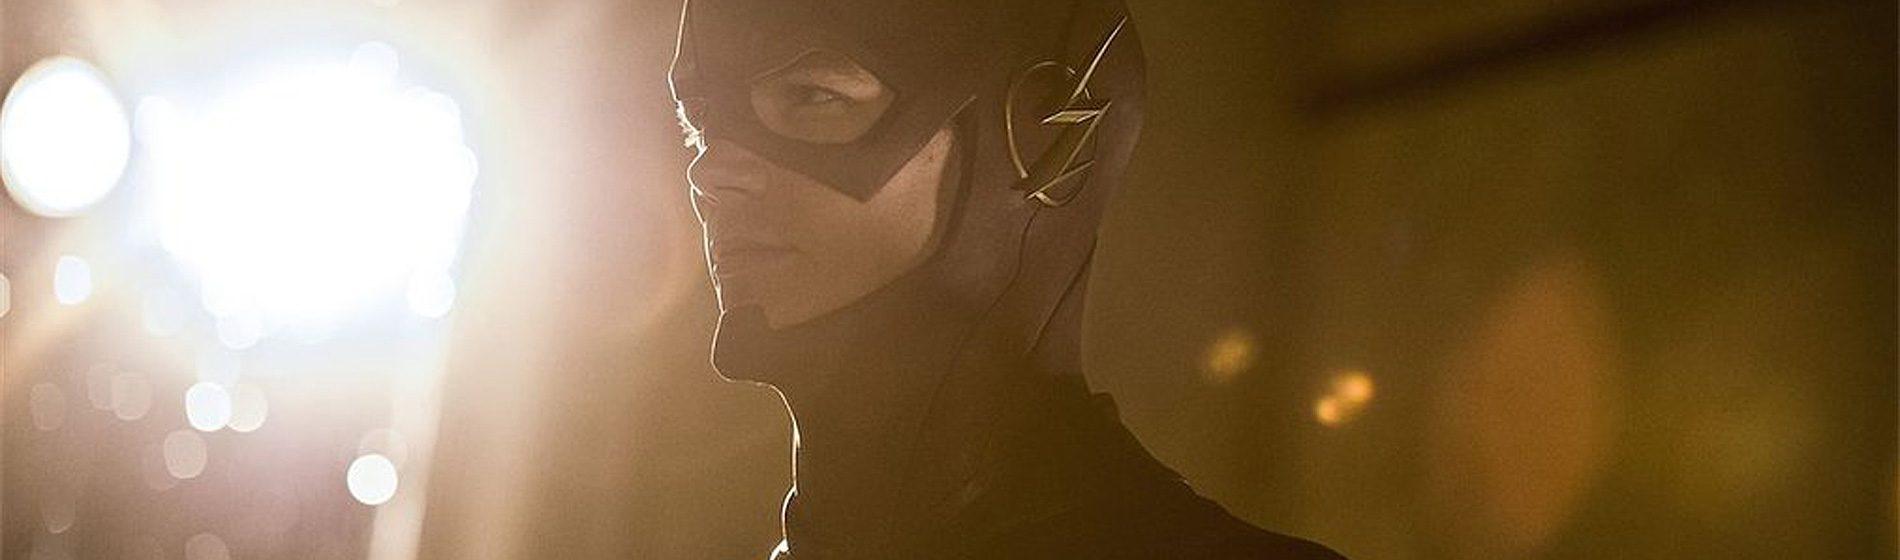 The Flash - Season 1 Episode 5 - Plastique